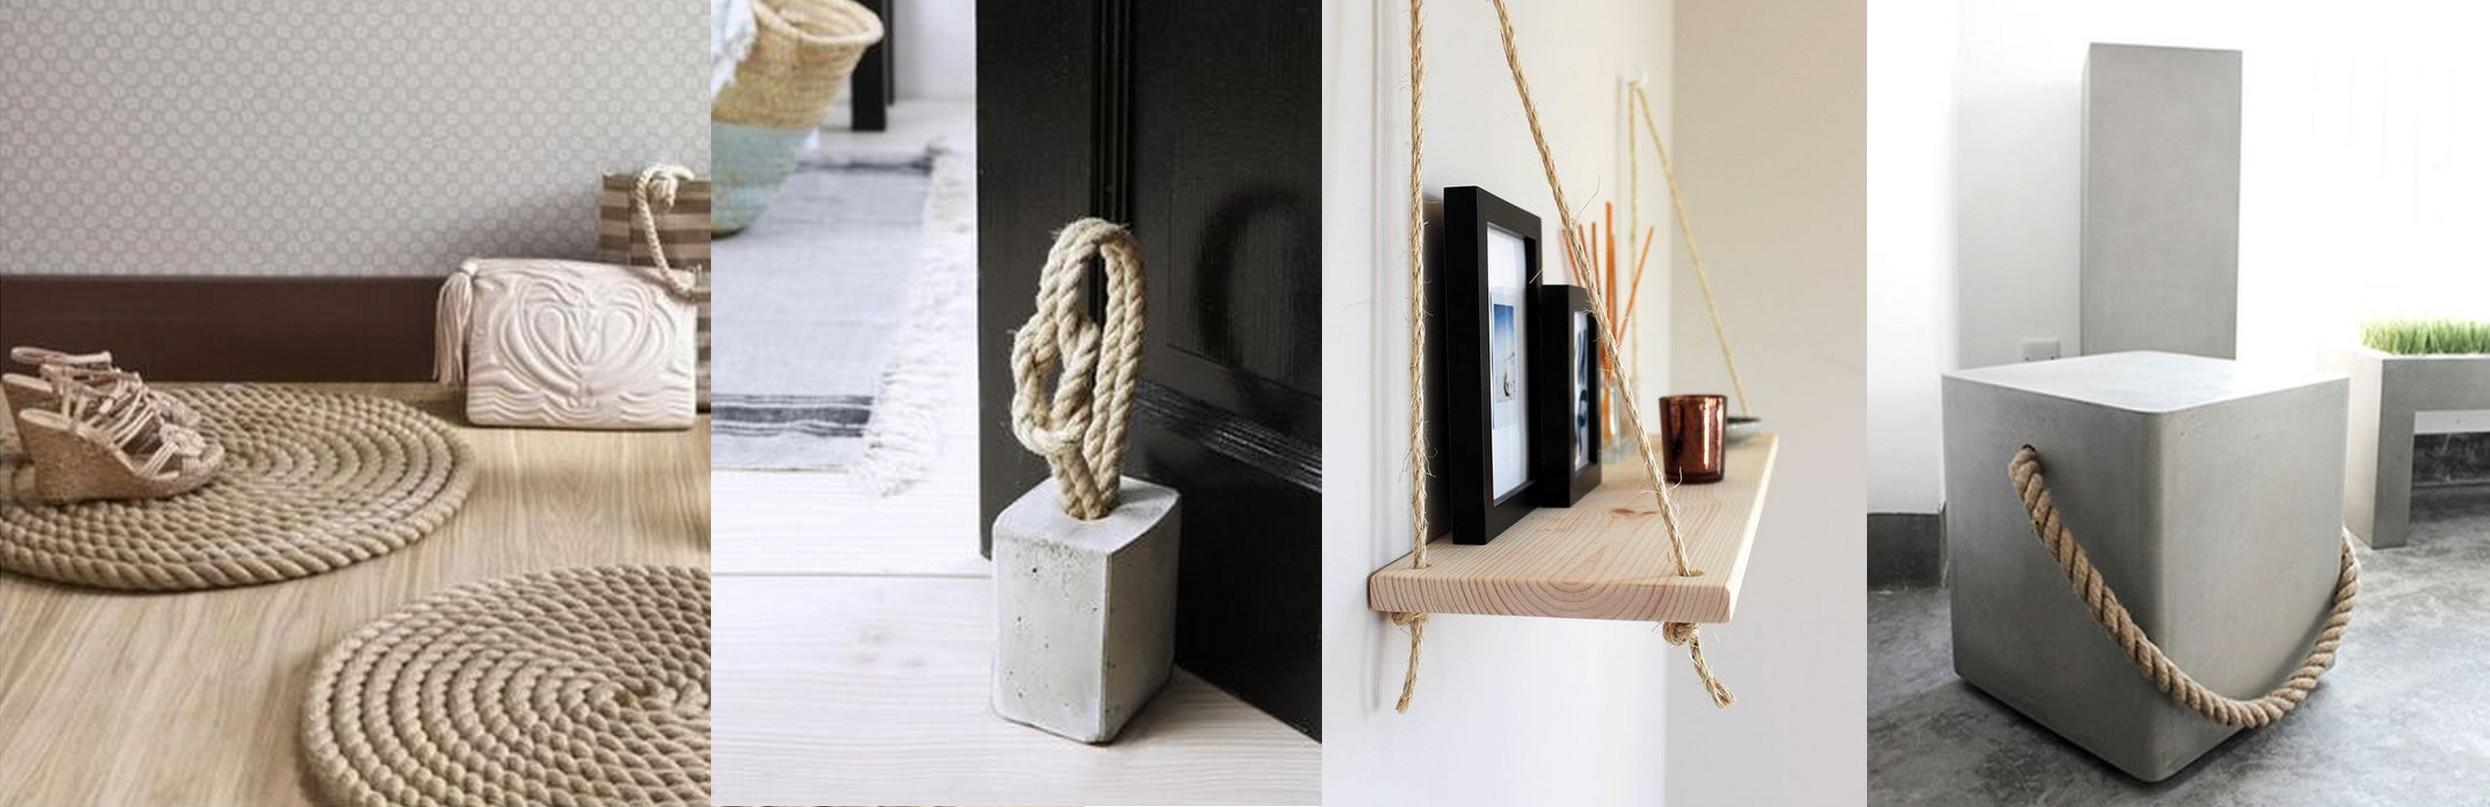 Matériaux (corde).jpg